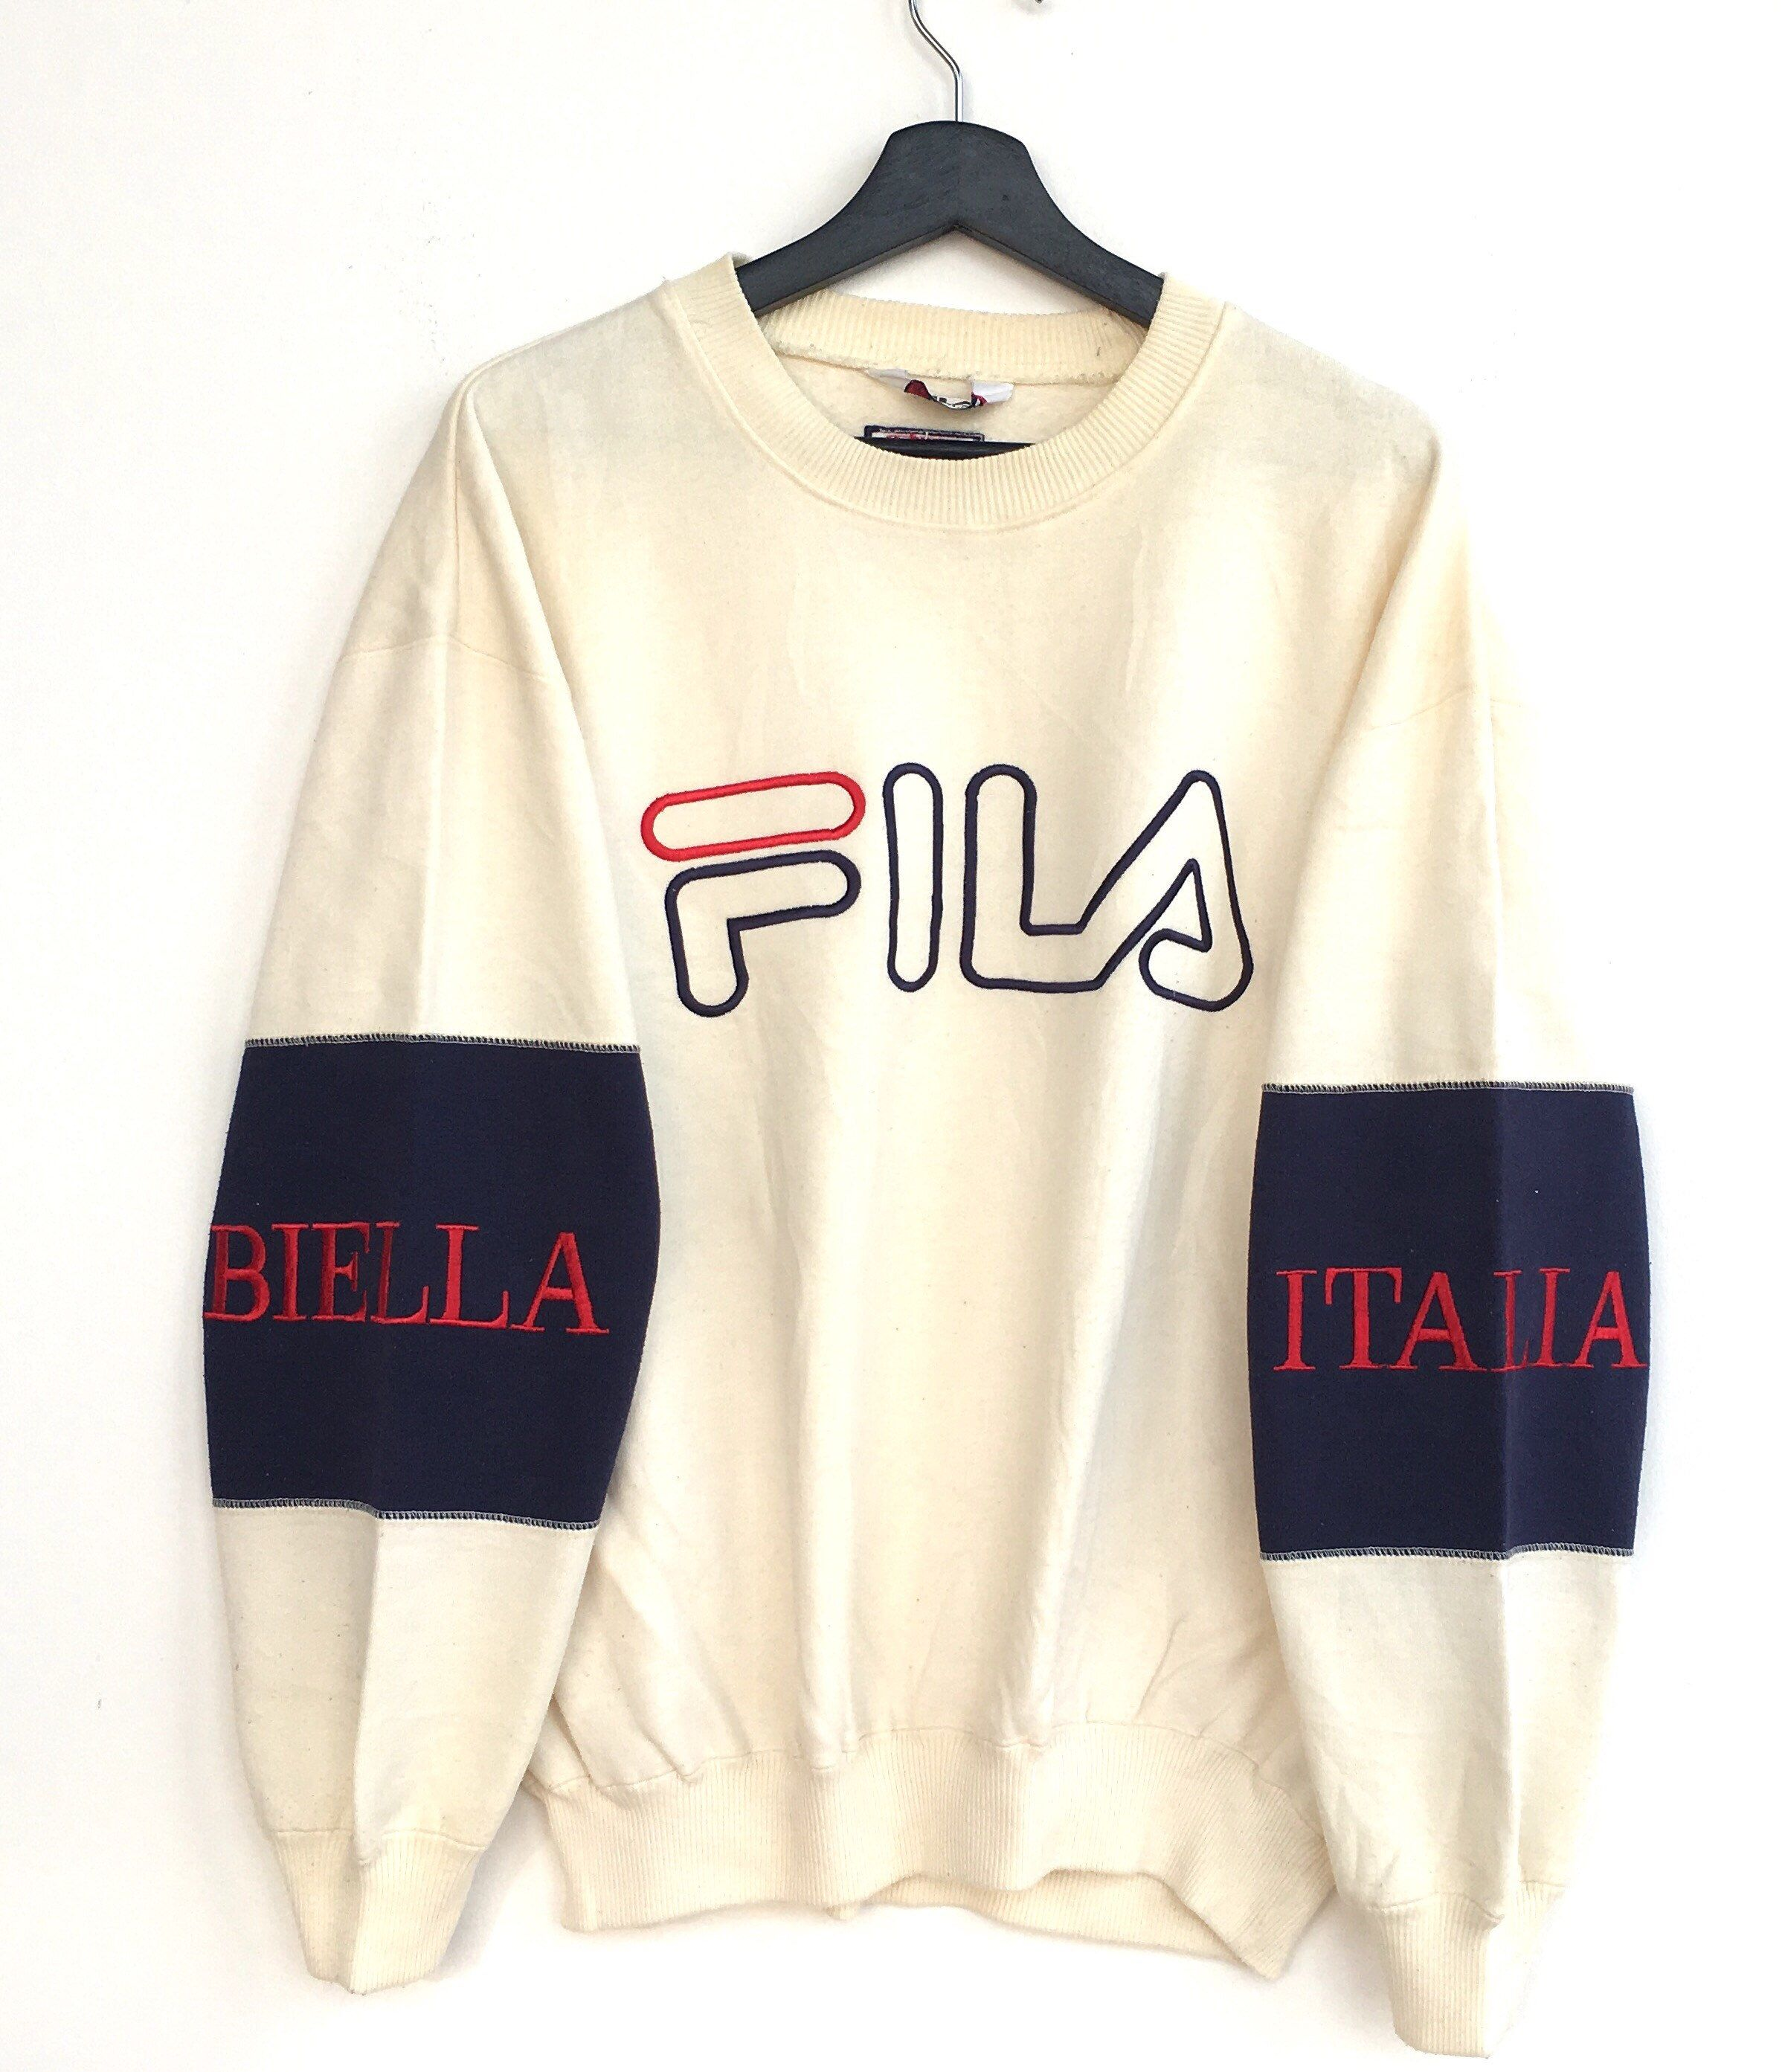 988f0eccf6ce FILA Men Clothing Big Logo Embroidery Sweatshirt Pullover Jumper Tennis  Casual 90s Large Size Fila Tennis Fila Bella Italia  clothing  hoodie ...